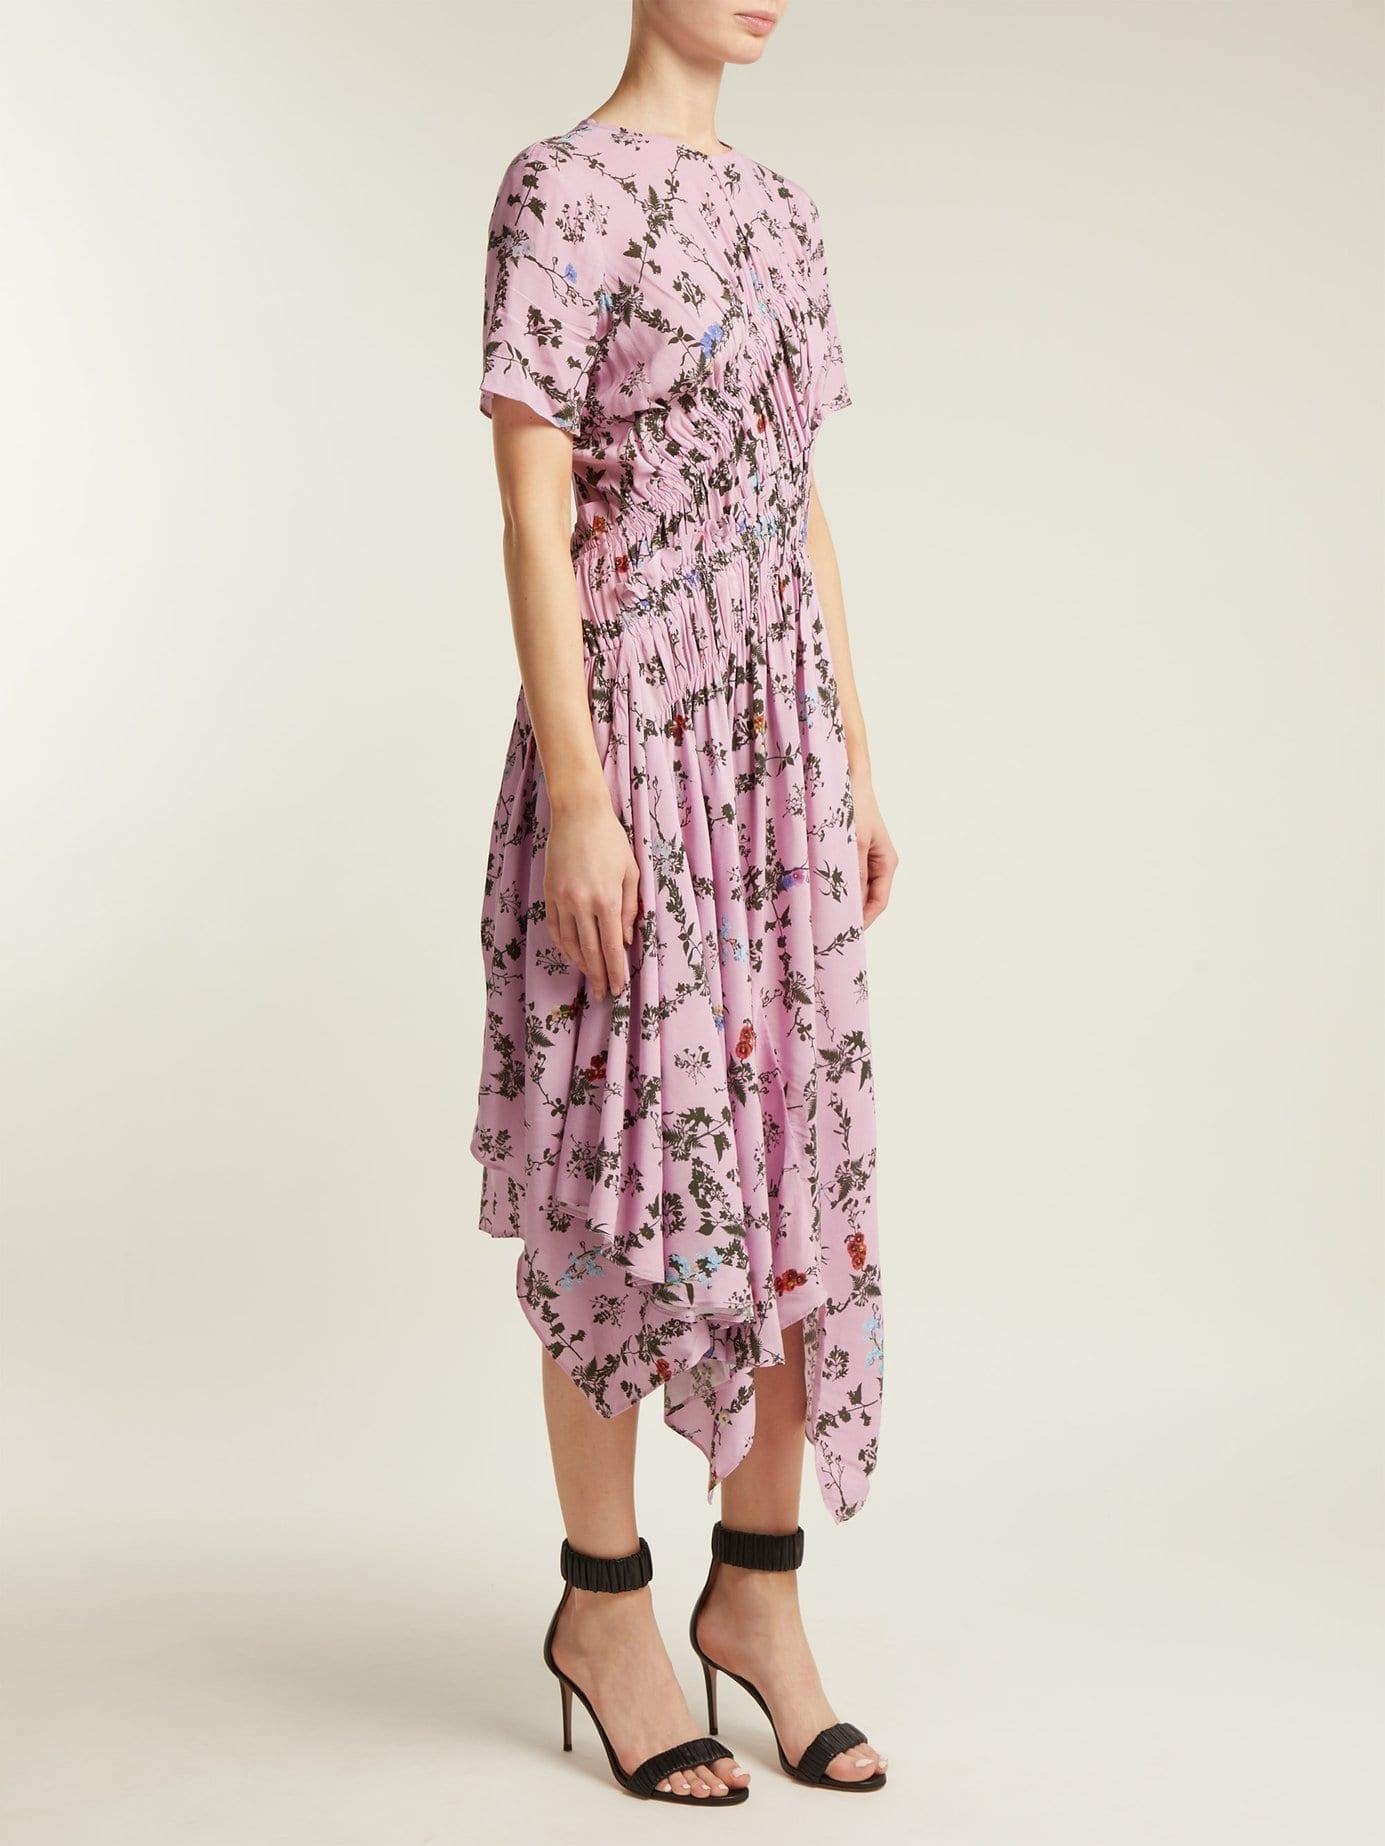 PREEN LINE Keziah Handkerchief Hem Midi Pink / Floral Printed Dress